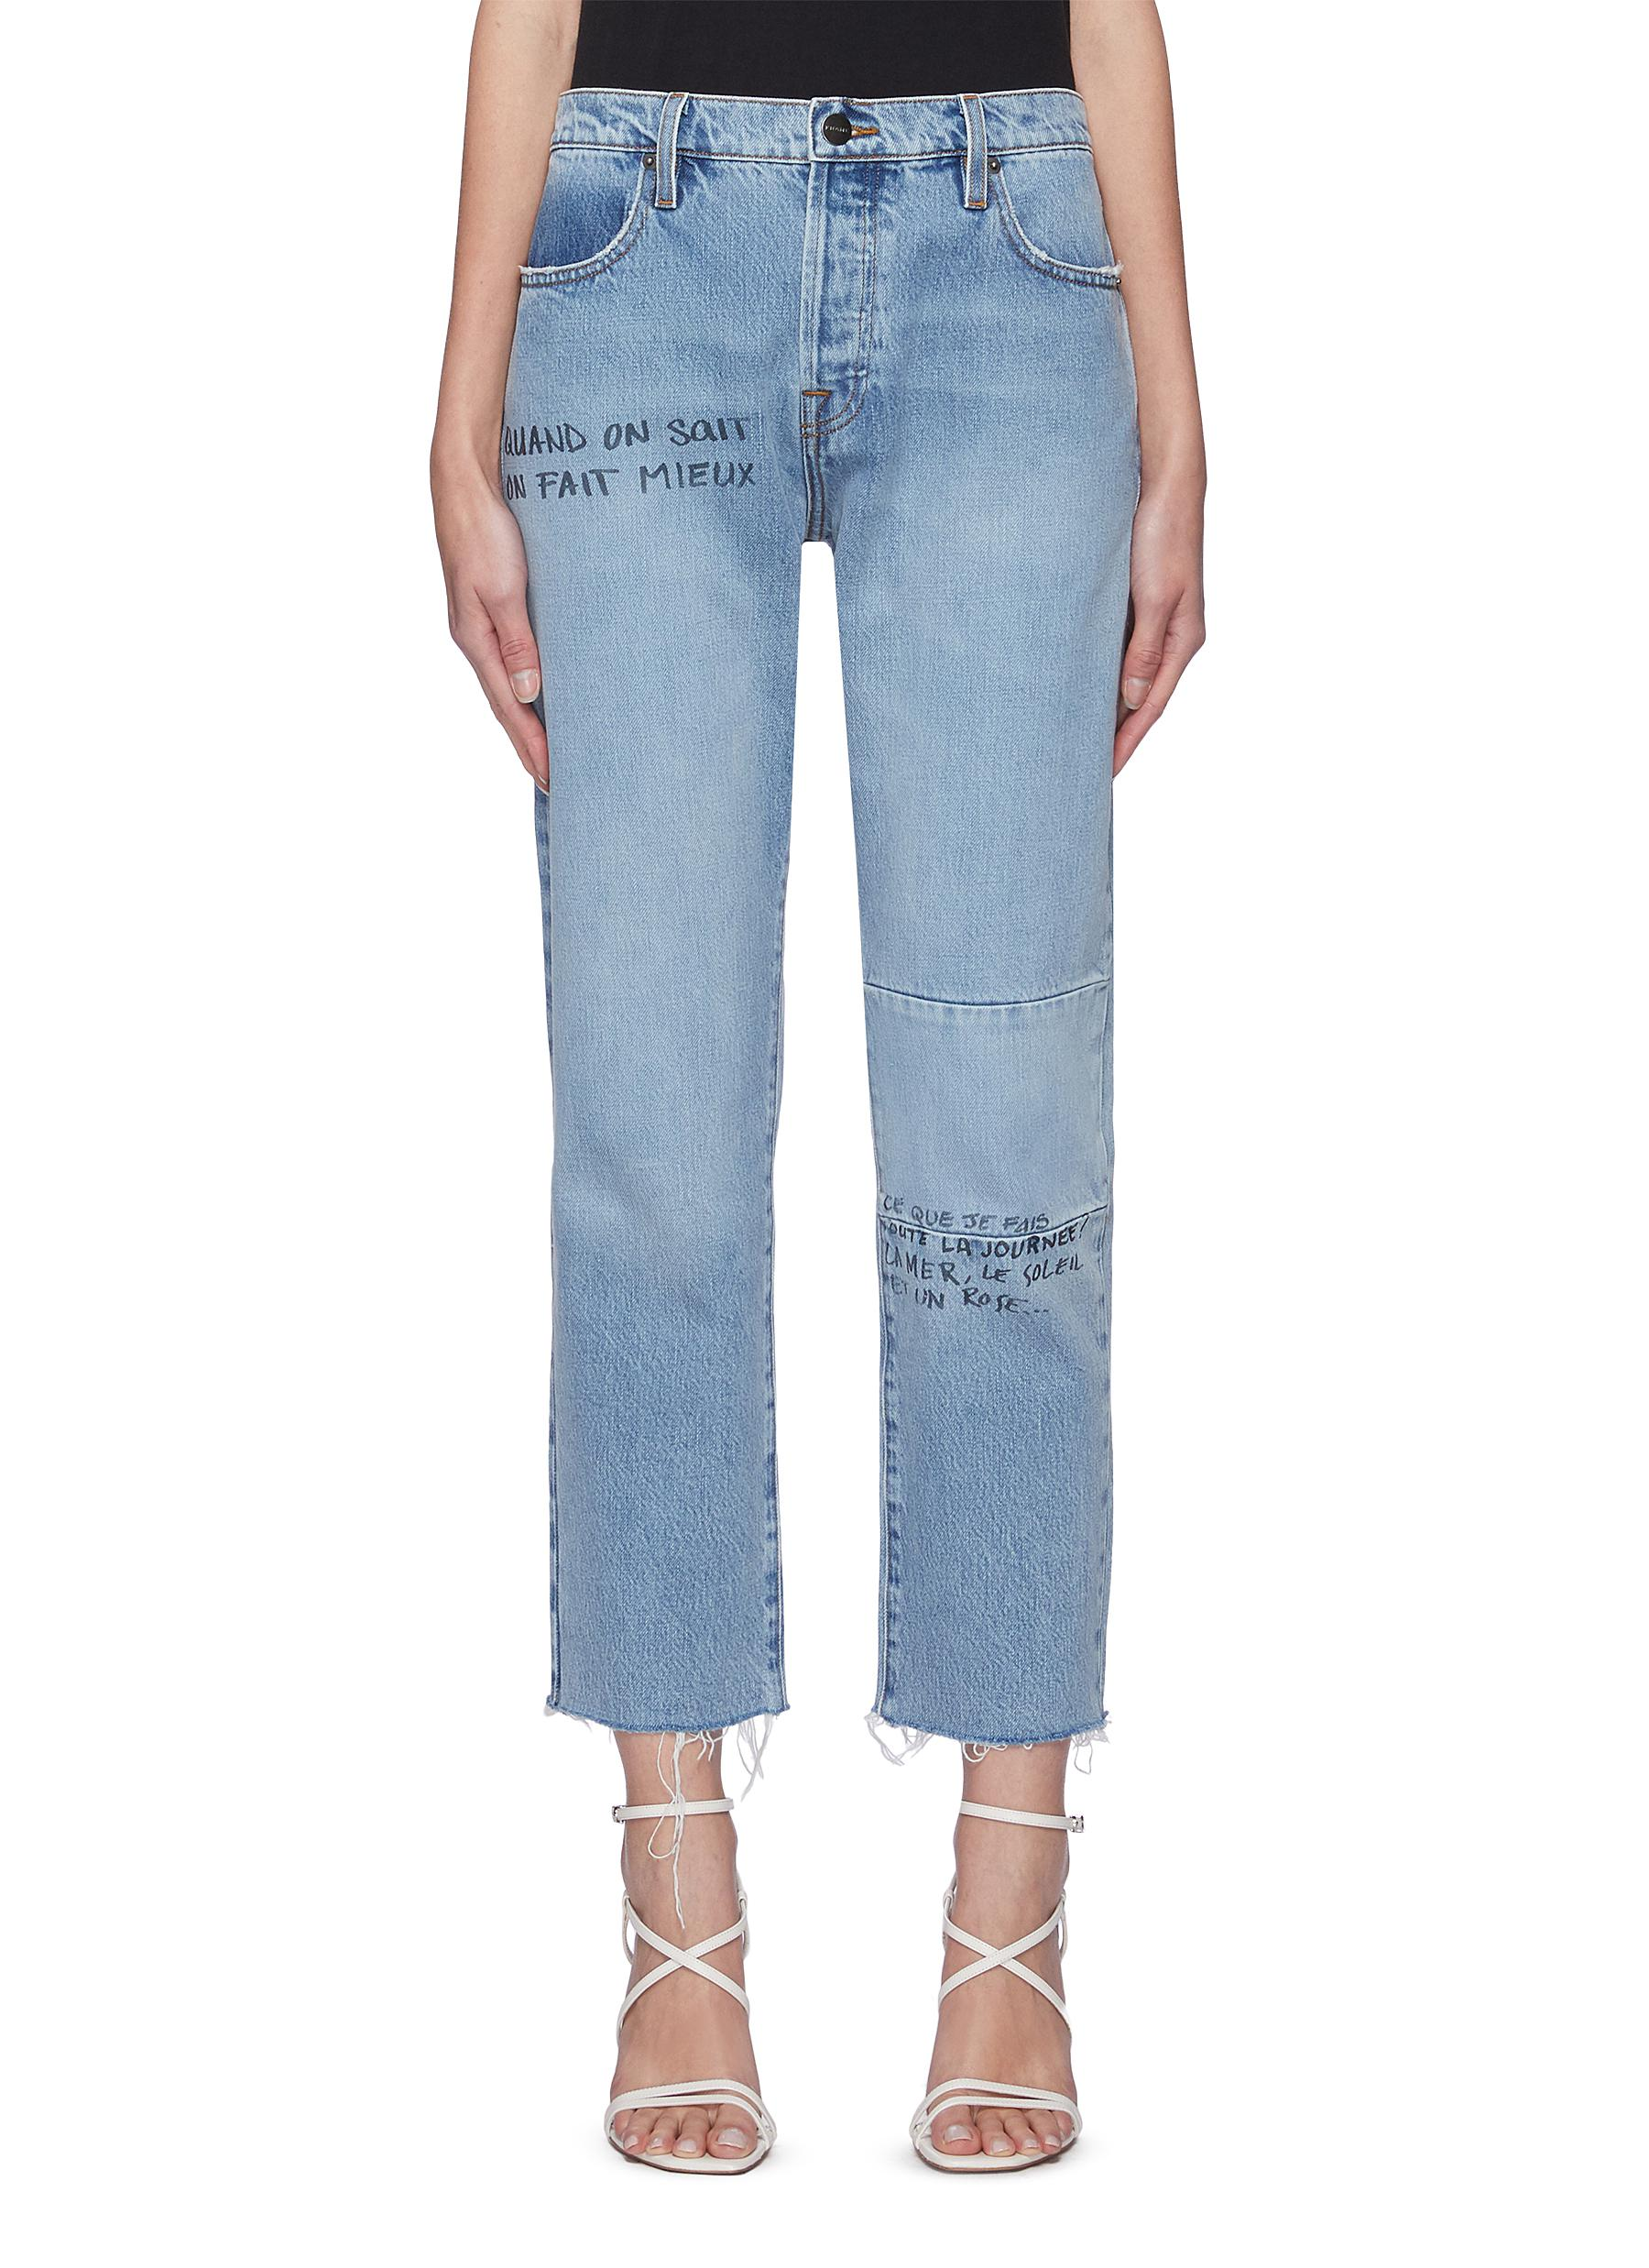 """""Le Slouch' Scribble Print Boyfriend Jeans"""